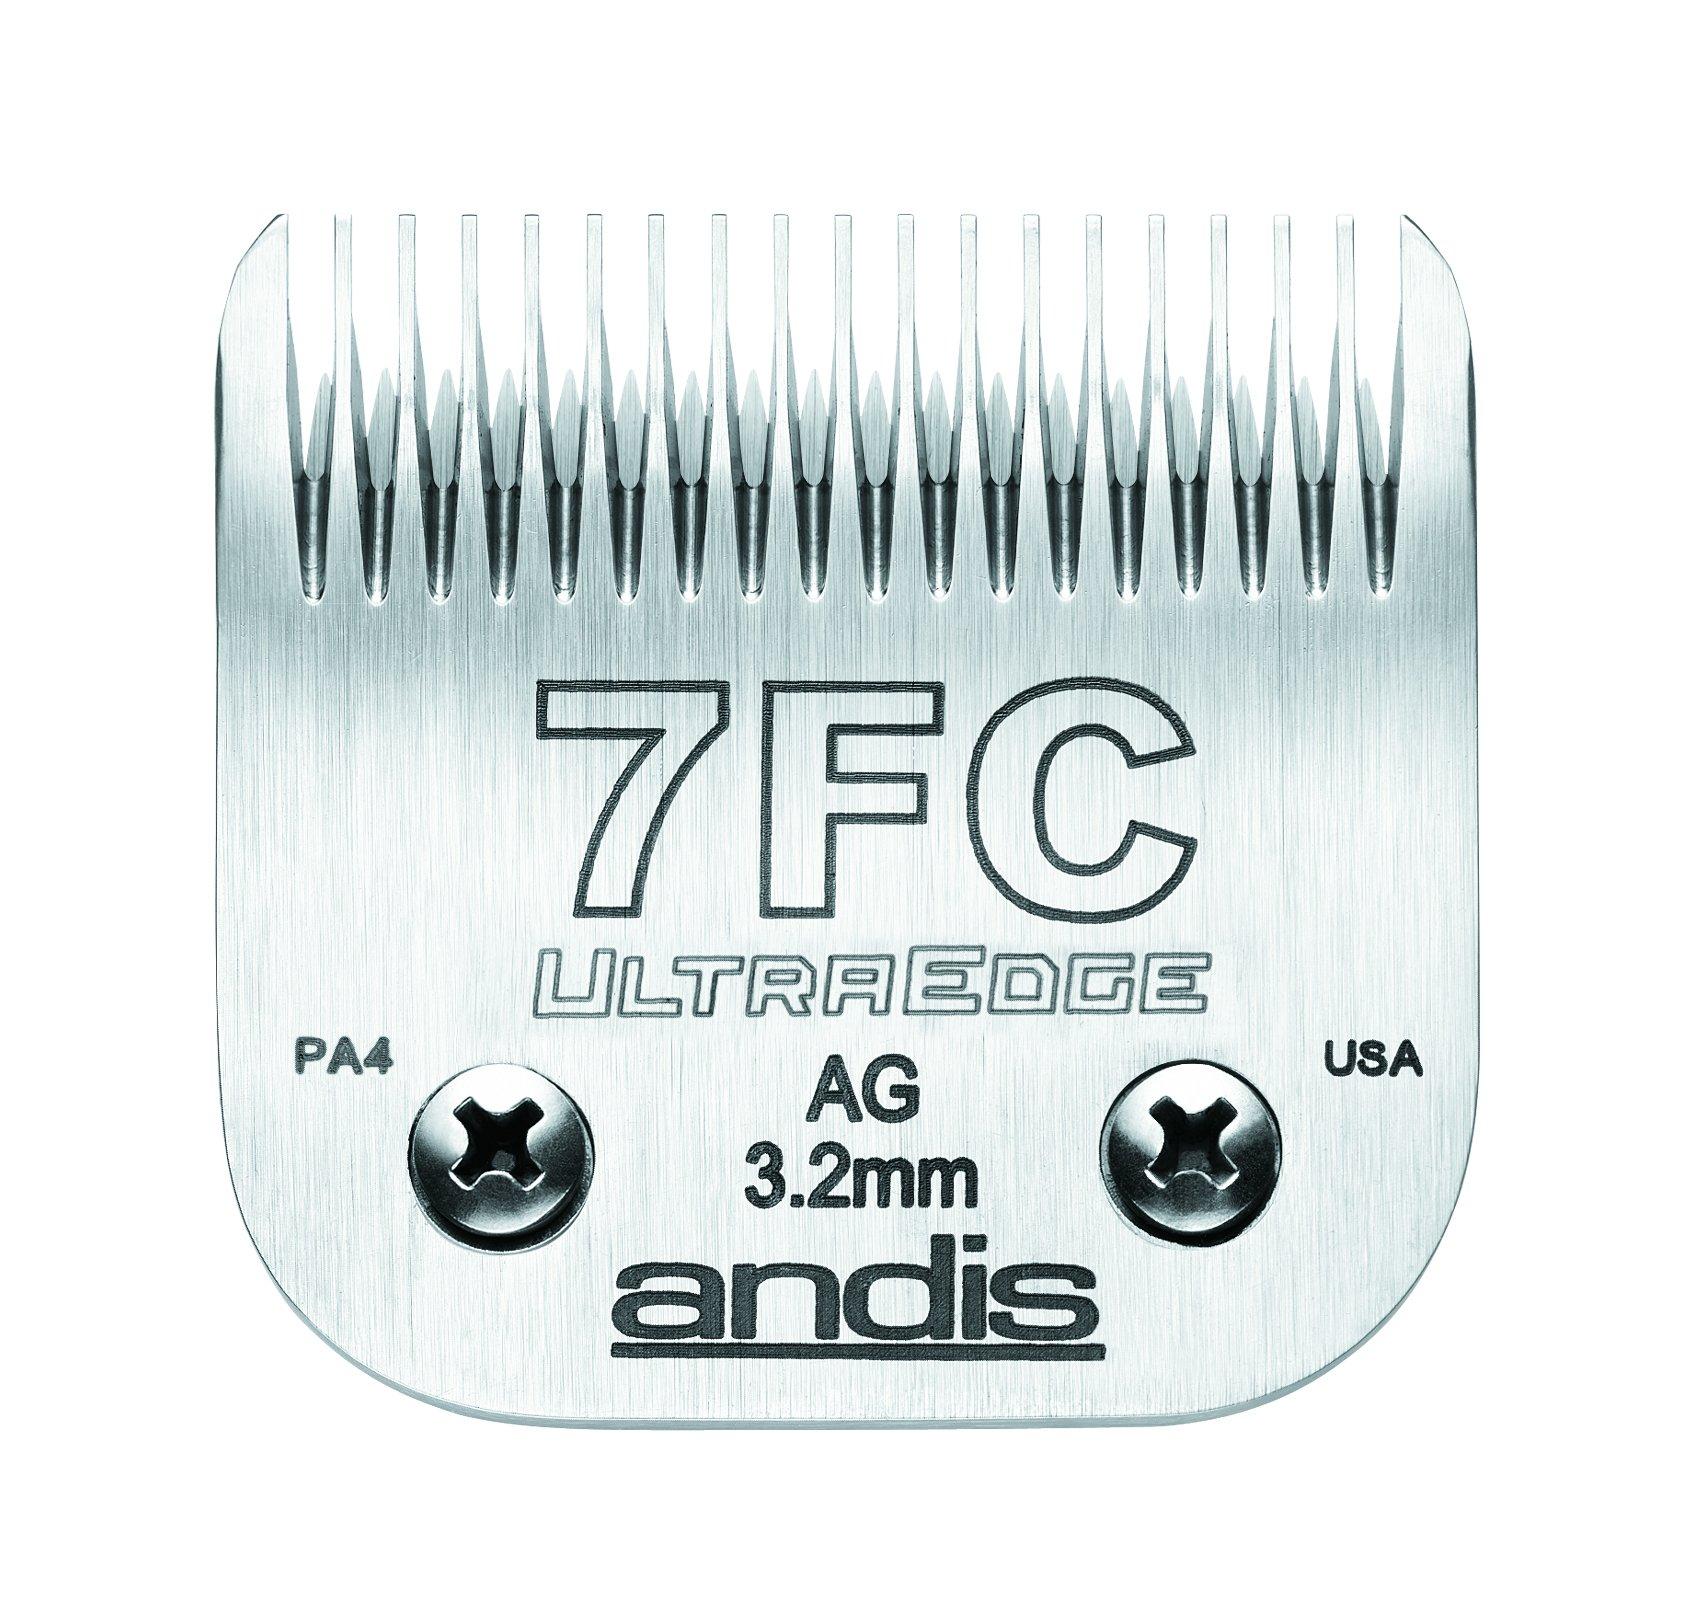 Cuchillas : Andis 7FC Ultra Edge 64121 Reemplazo